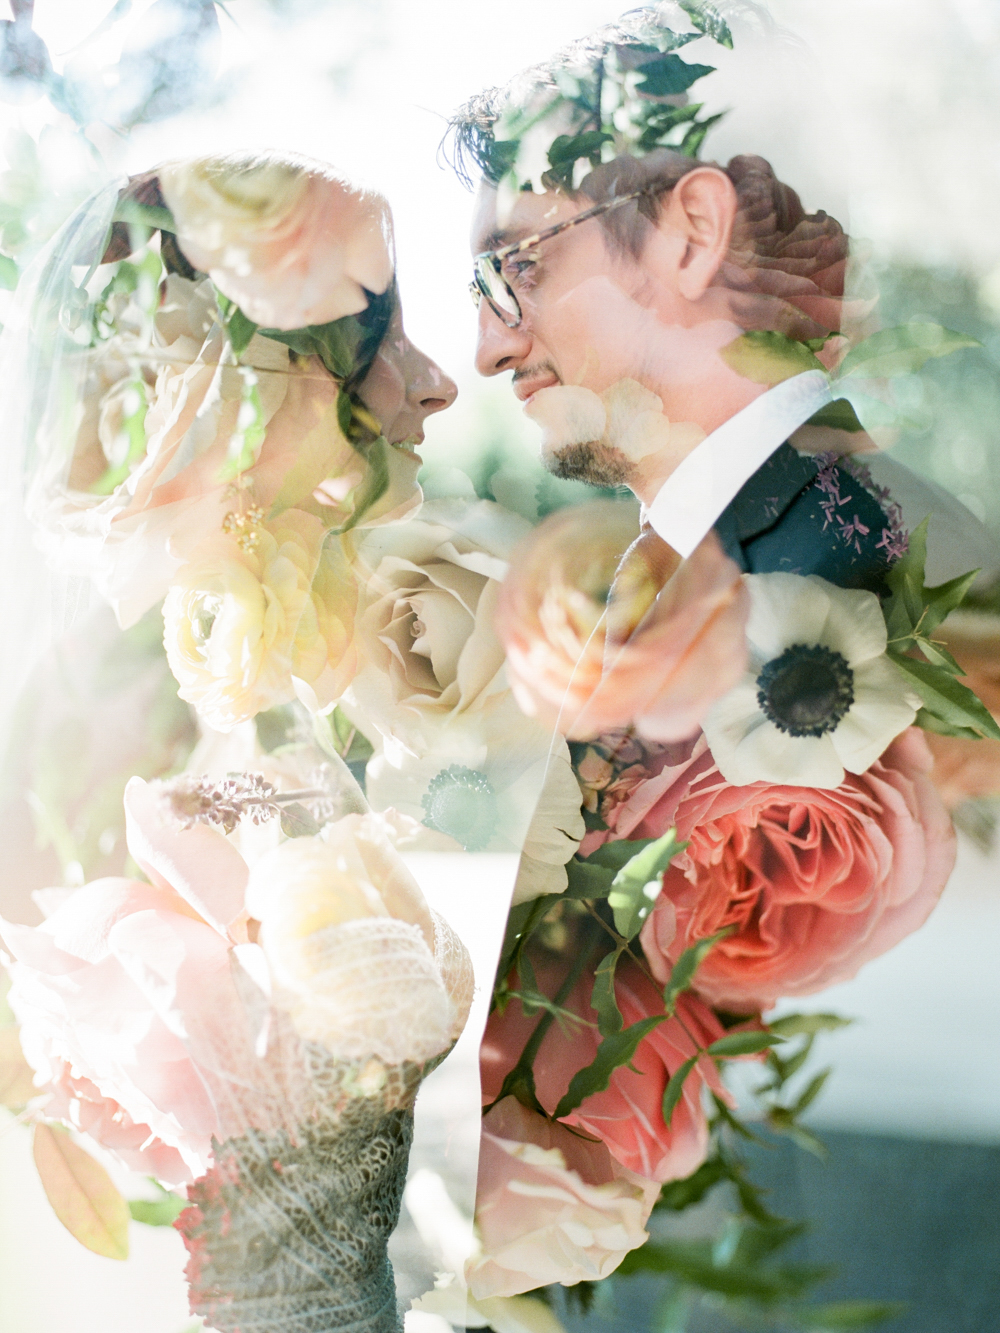 Christine Gosch - destination film photographer - houston wedding photographer - fine art film photographer - elopement photographer - destination wedding - understated wedding - simple beautiful wedding photography-64.jpg